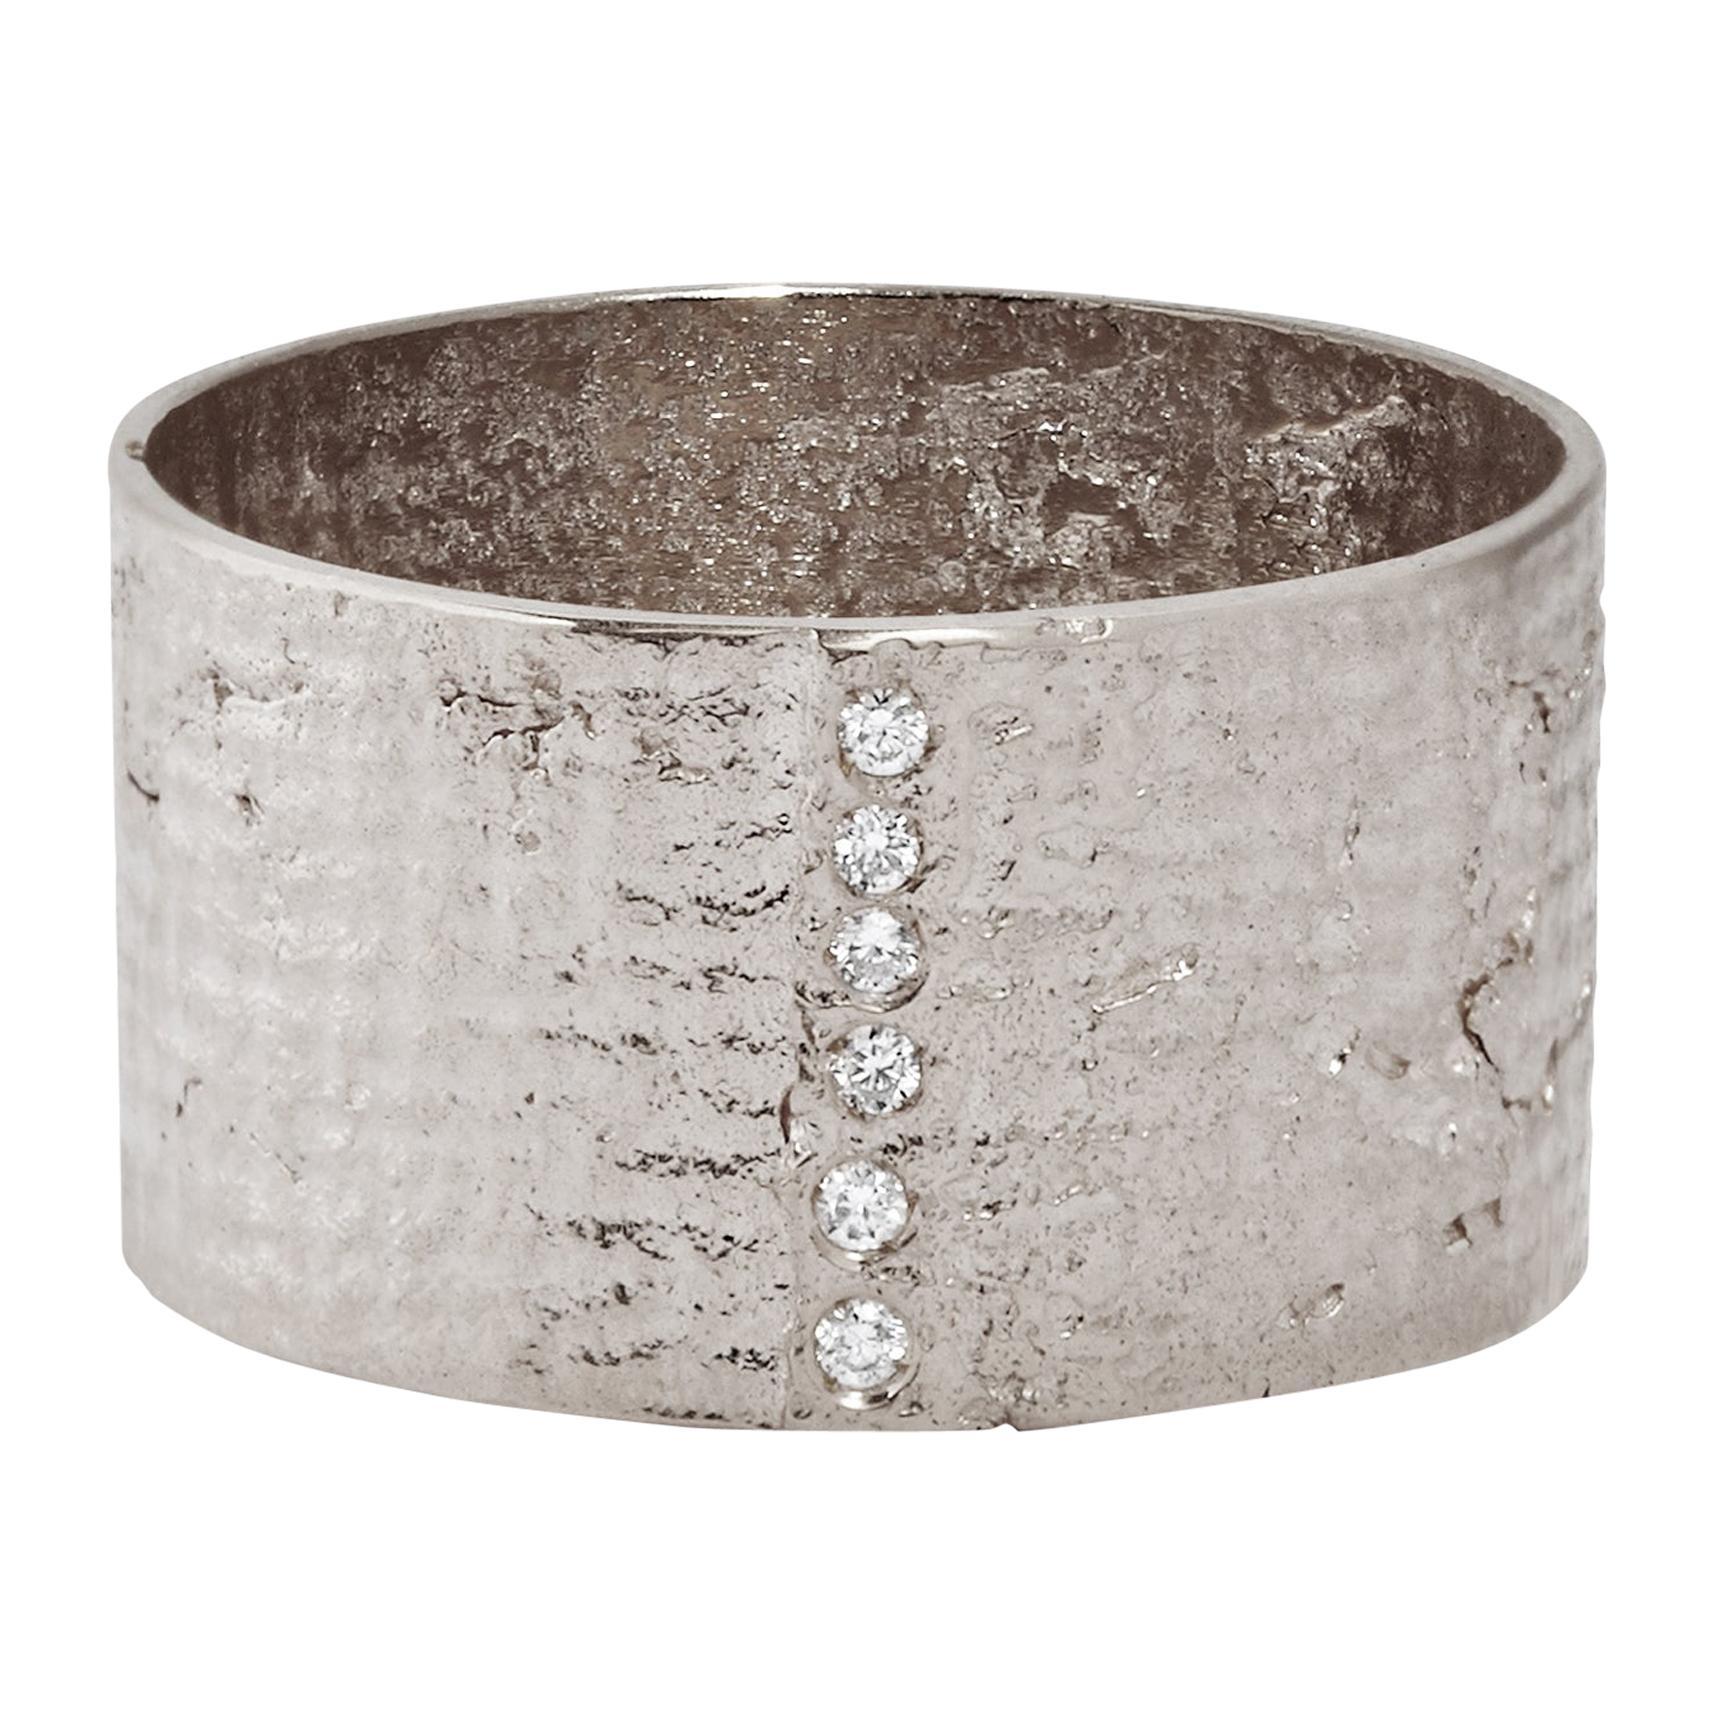 18 Karat White Gold Paper Cigar Ring with Diamonds by Allison Bryan